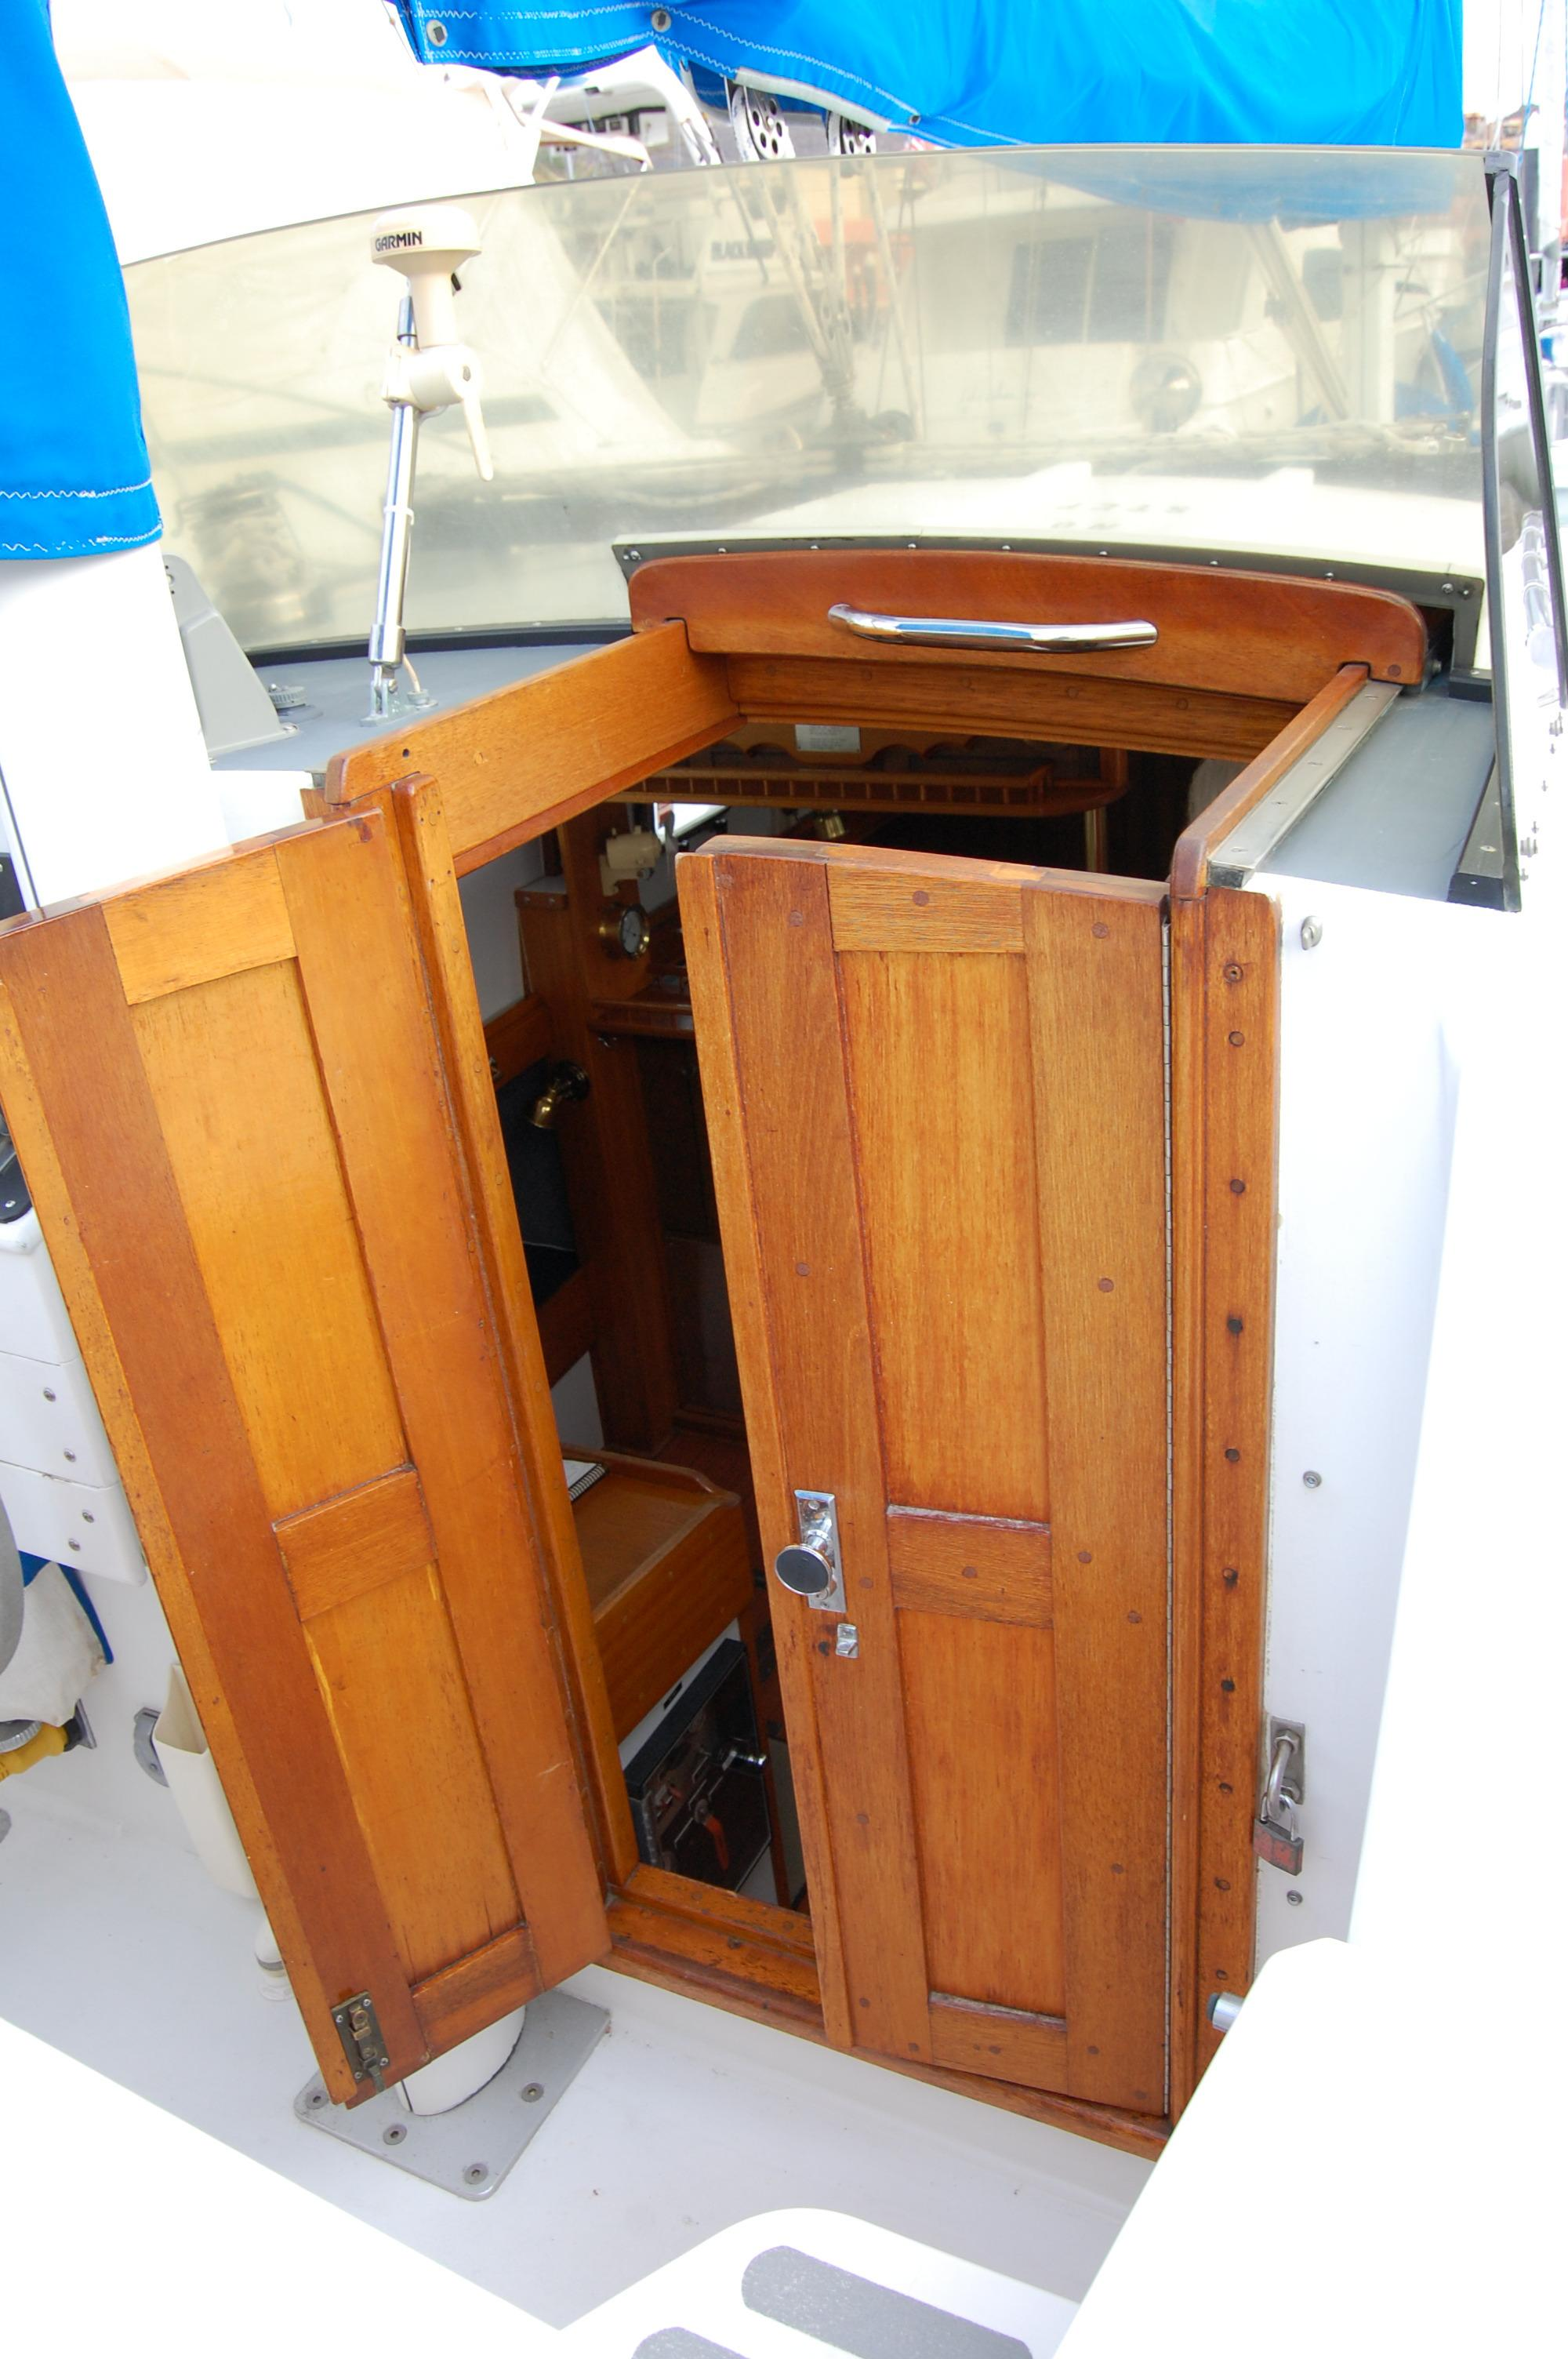 44' Custom C-Smoke Ferrocement Ketch+Lines in deck storage